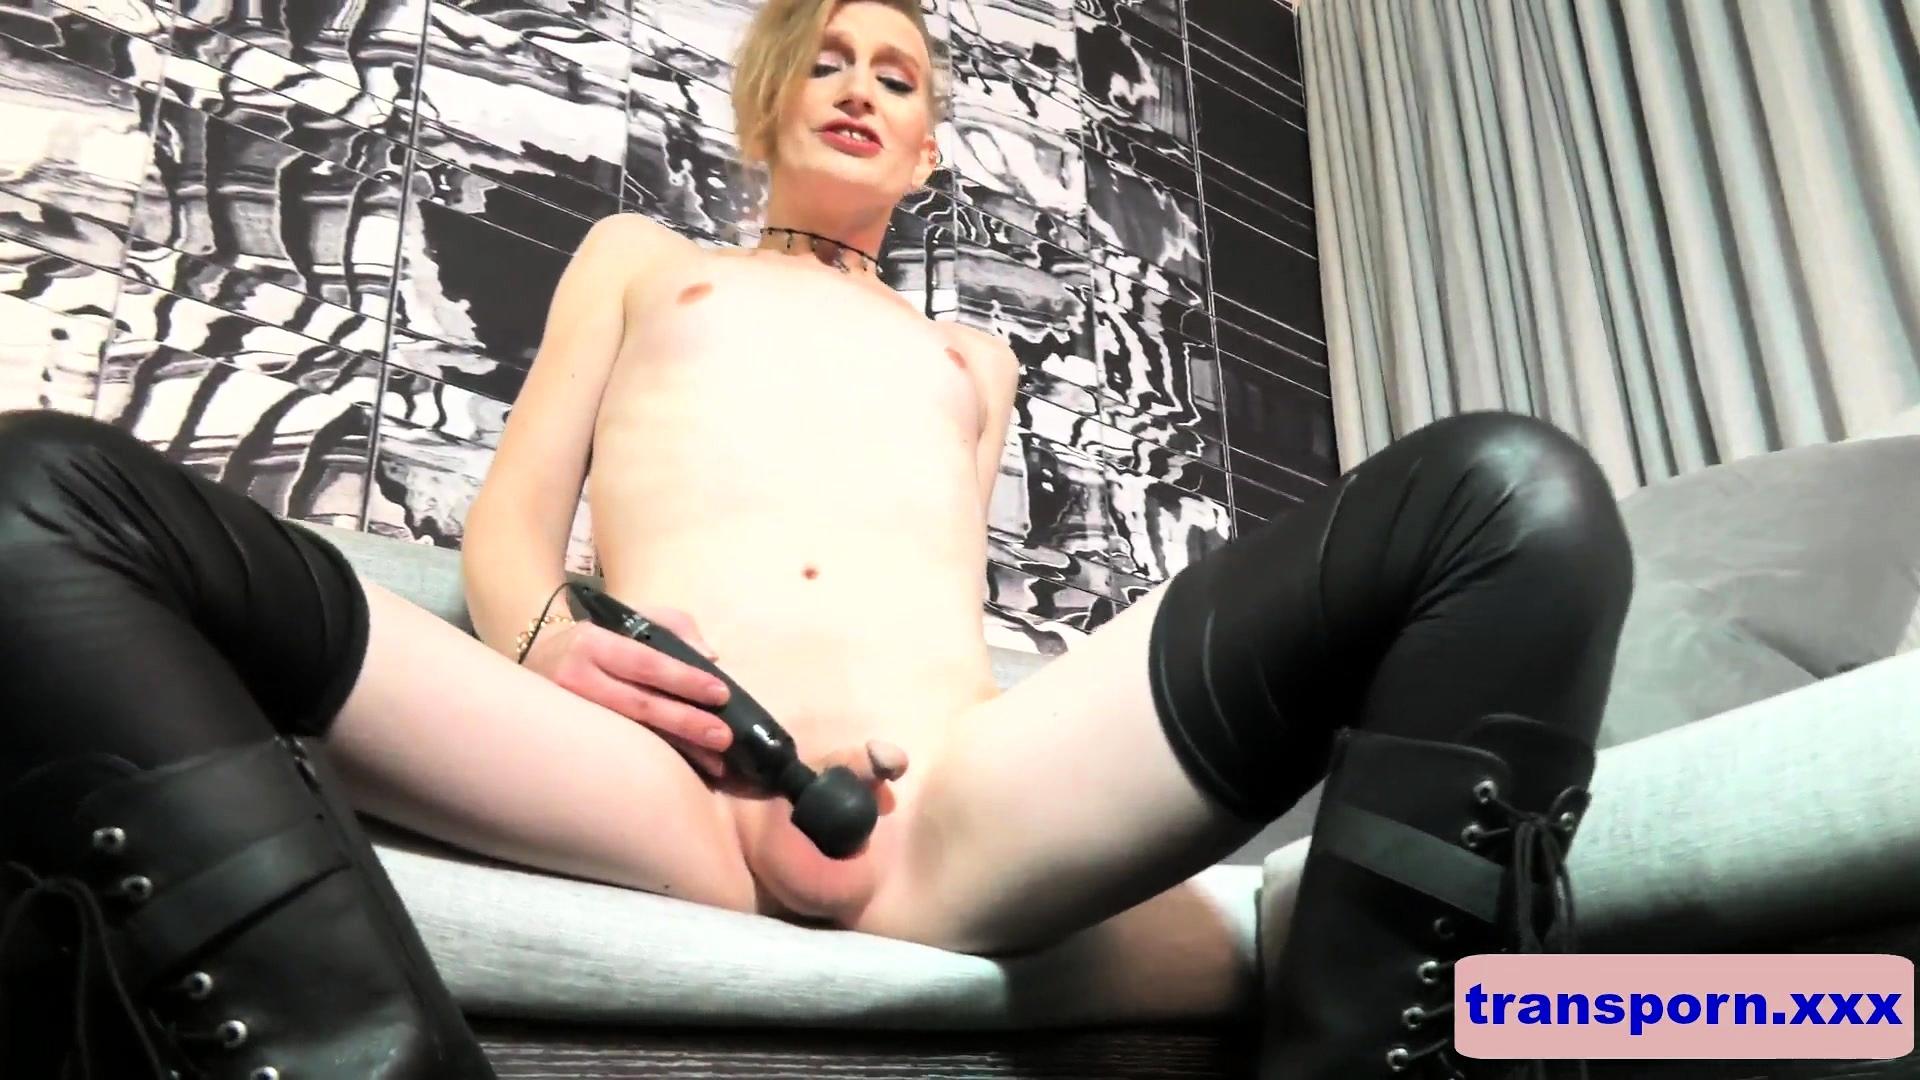 Cute alternative femboy uses a vibrator